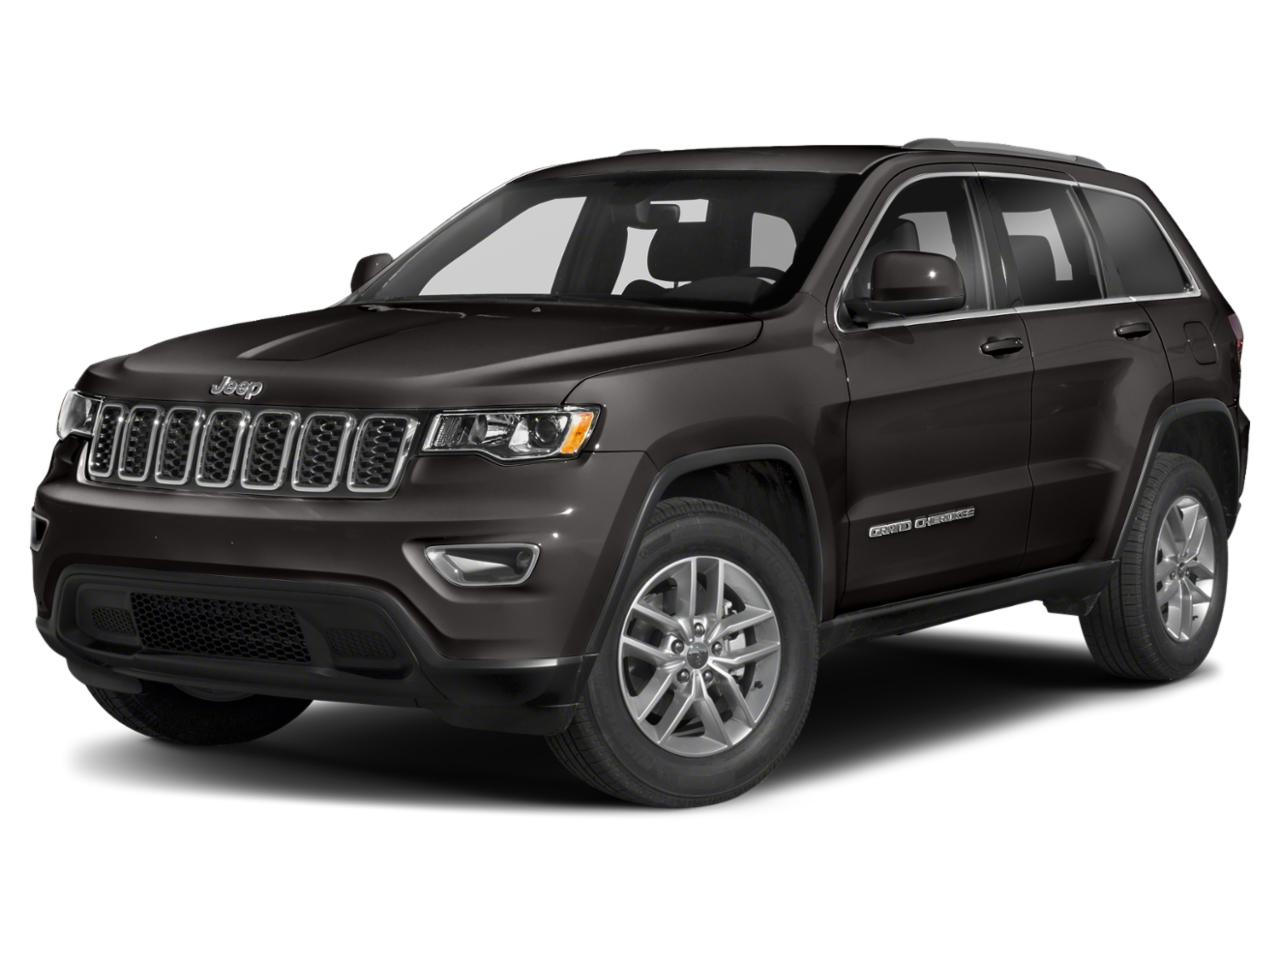 2019 Jeep Grand Cherokee Vehicle Photo in TUCSON, AZ 85705-6014